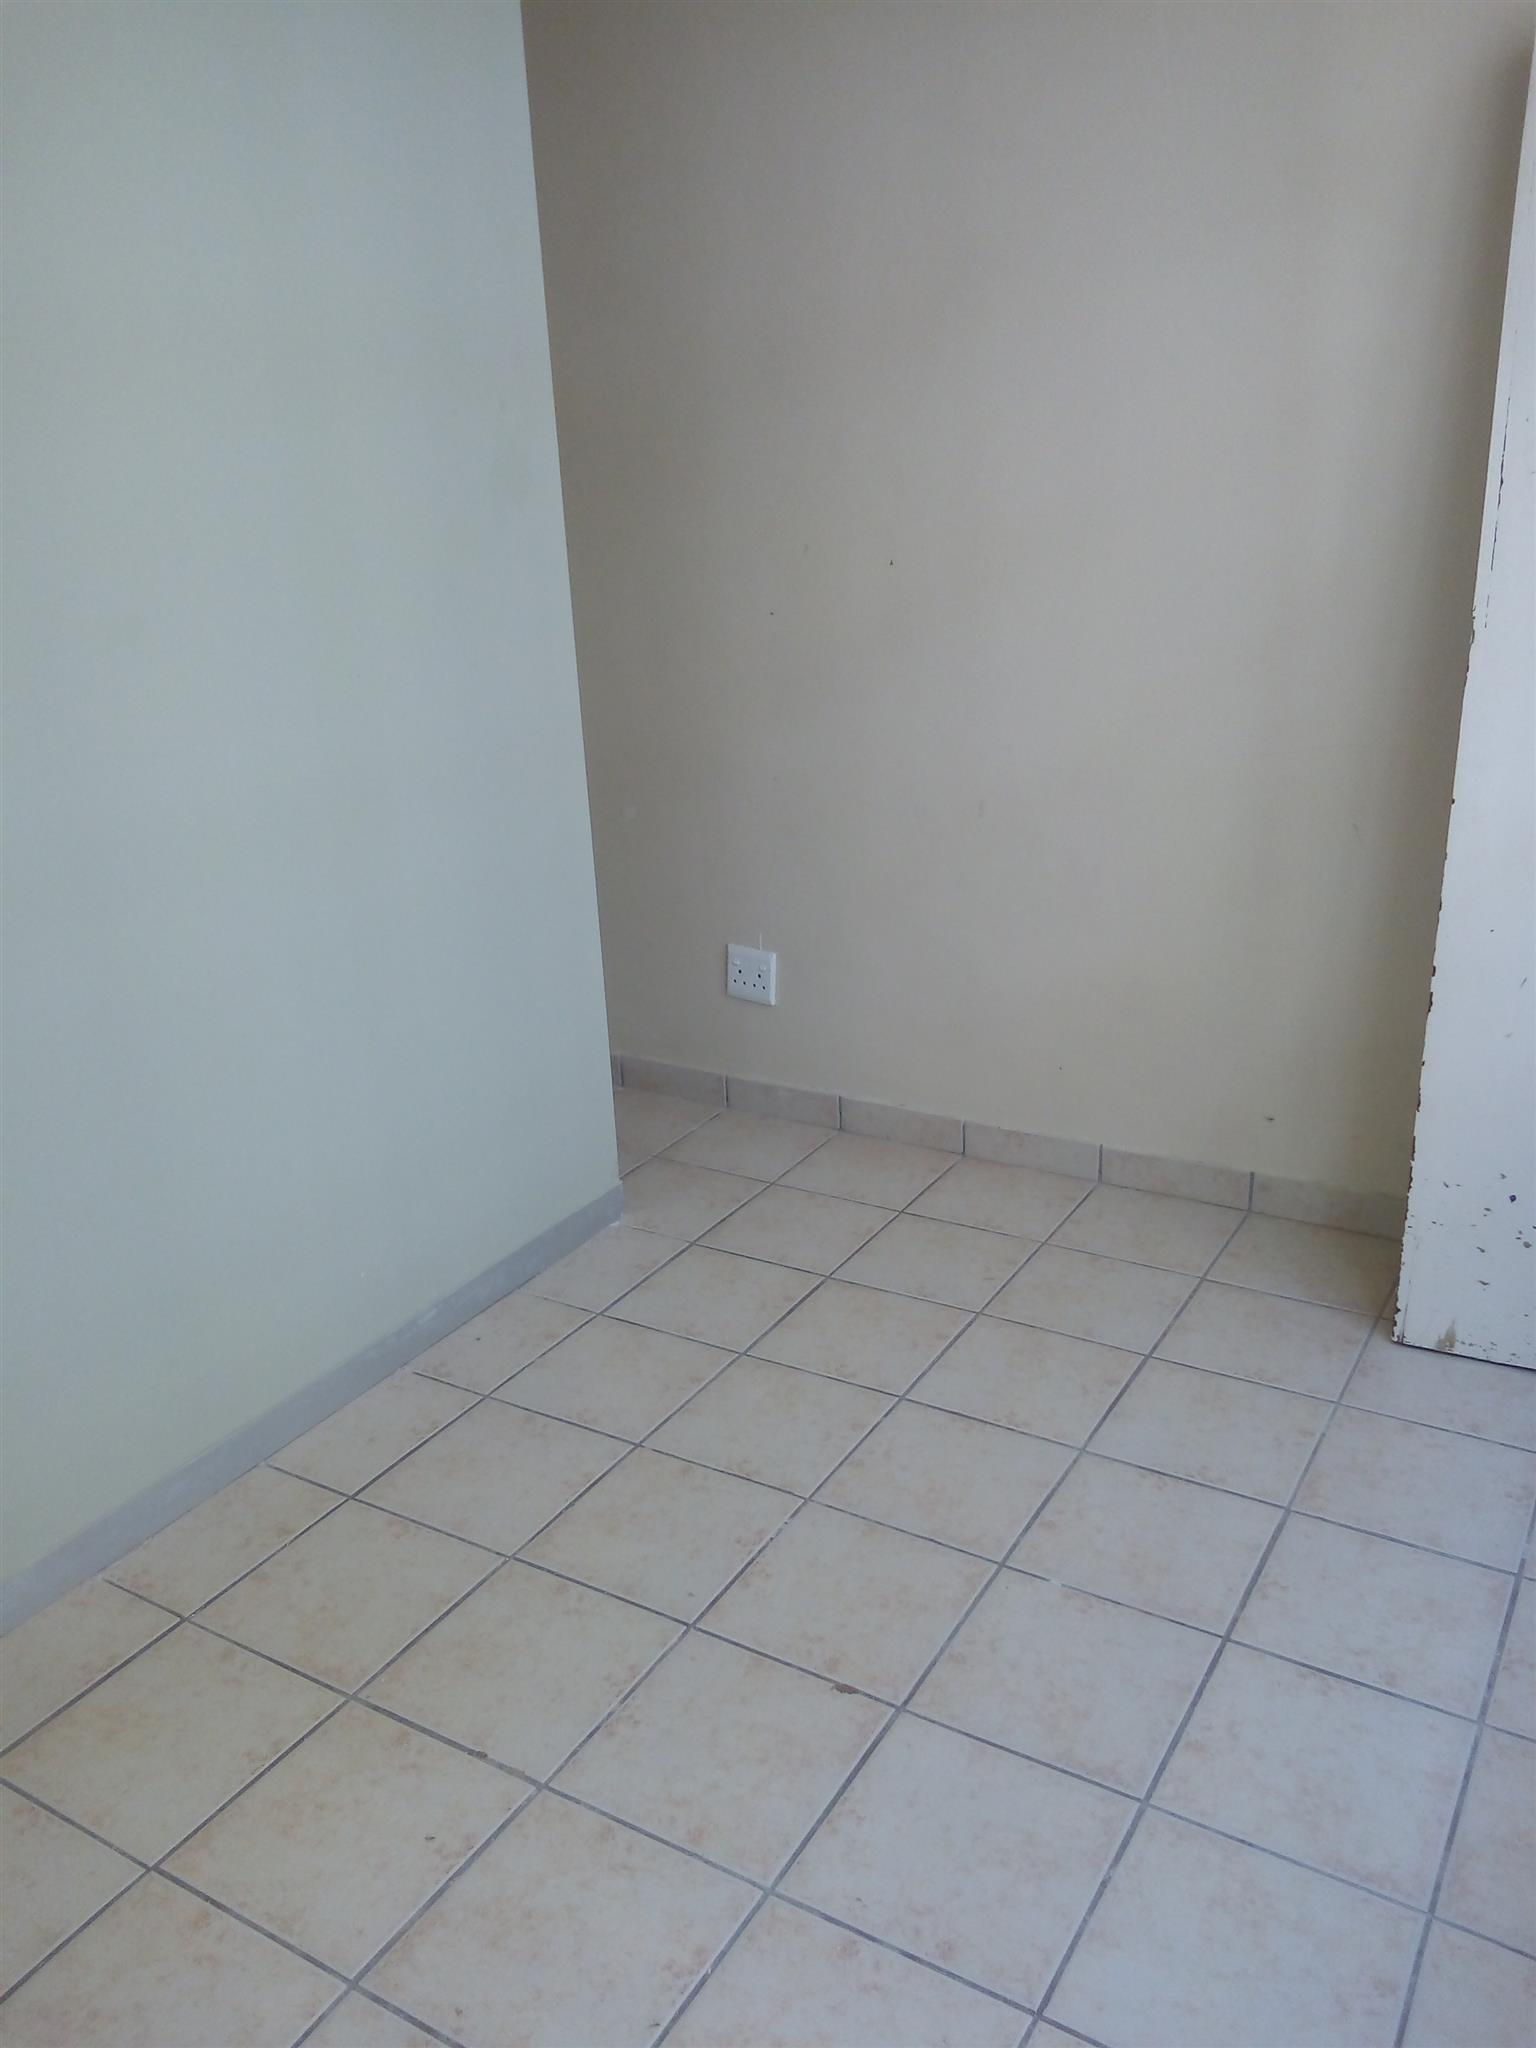 Elsenburg flat